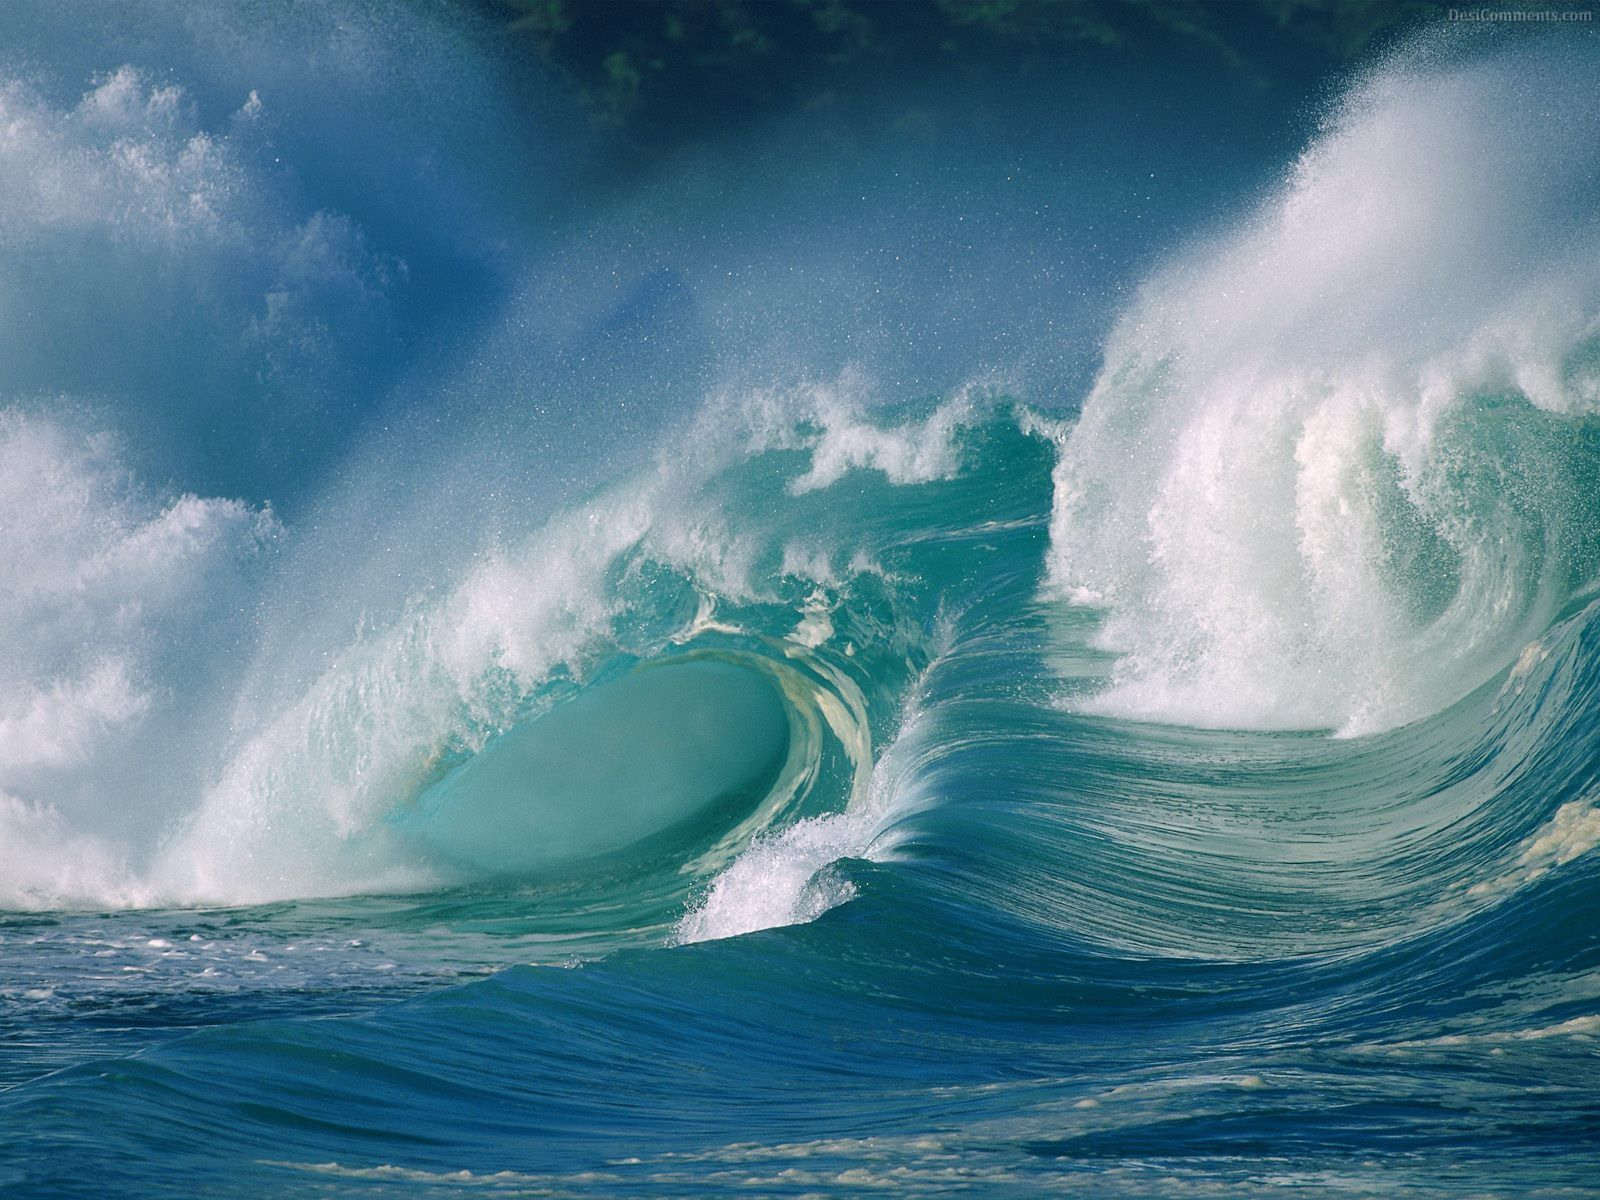 Ocean Wallpaper 22   DesiCommentscom 1600x1200